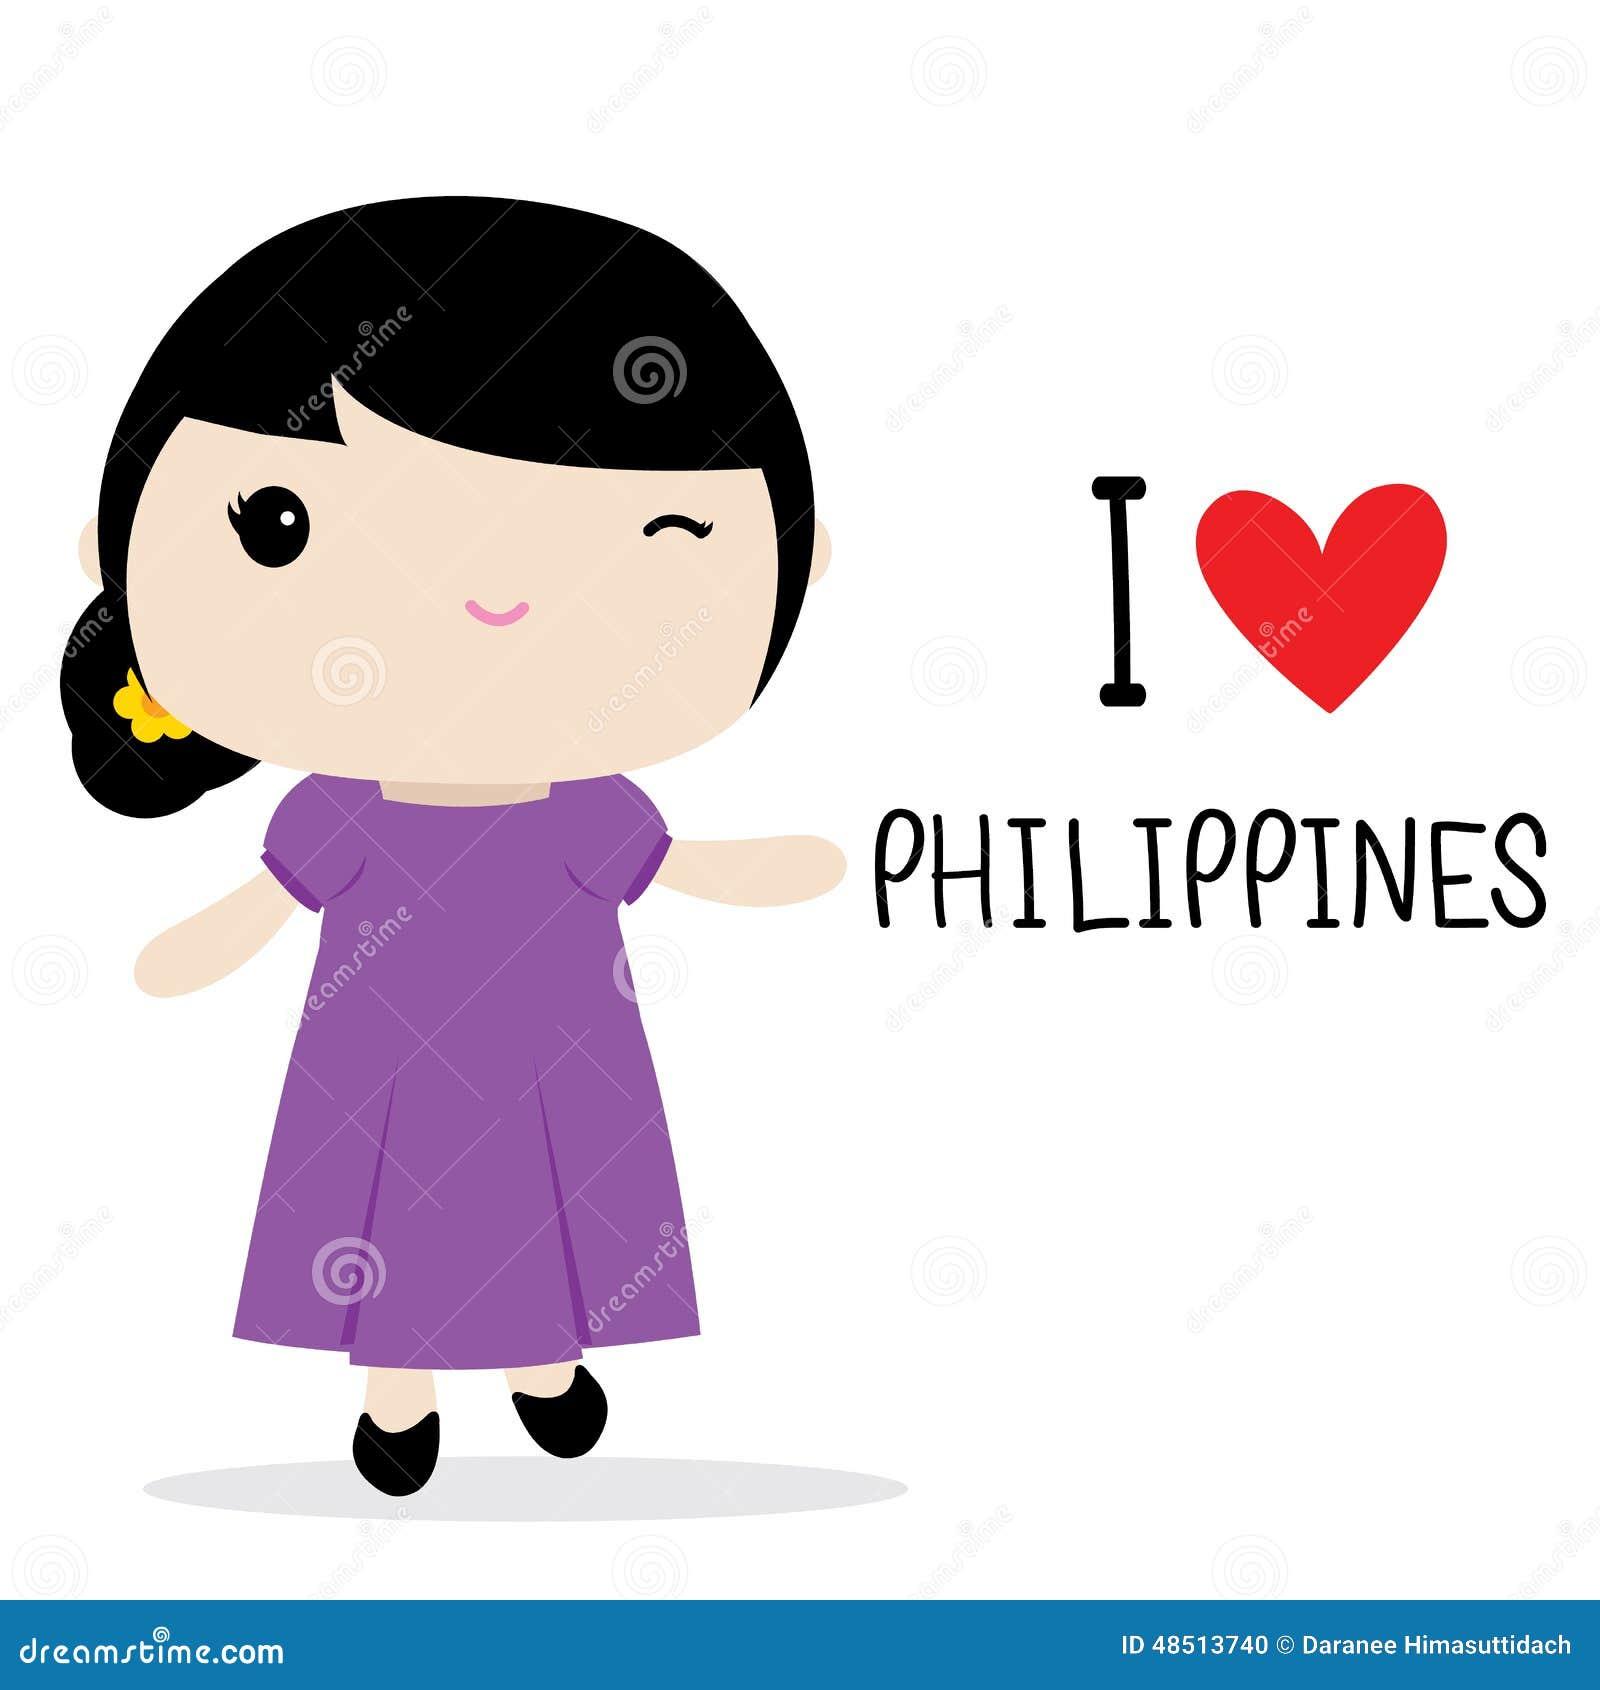 Philippines Women National Dress Cartoon Vector Stock Vector - Image: 48513740 X 23 Costume